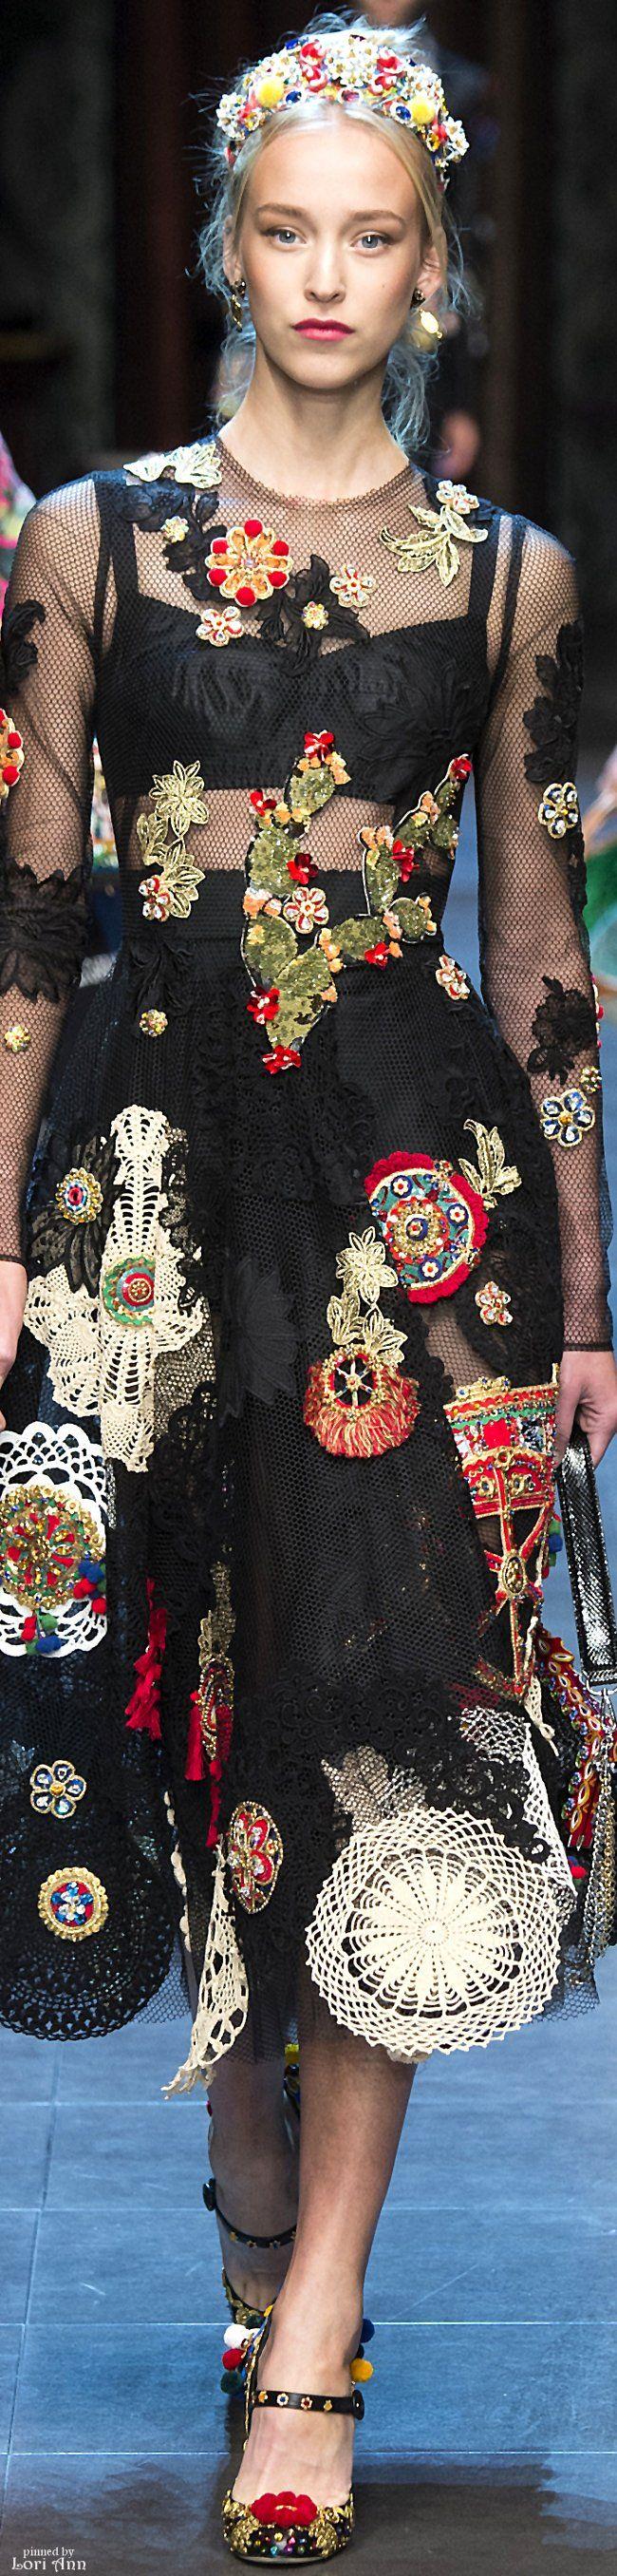 Dolce & Gabbana Spring 2016 RTW: